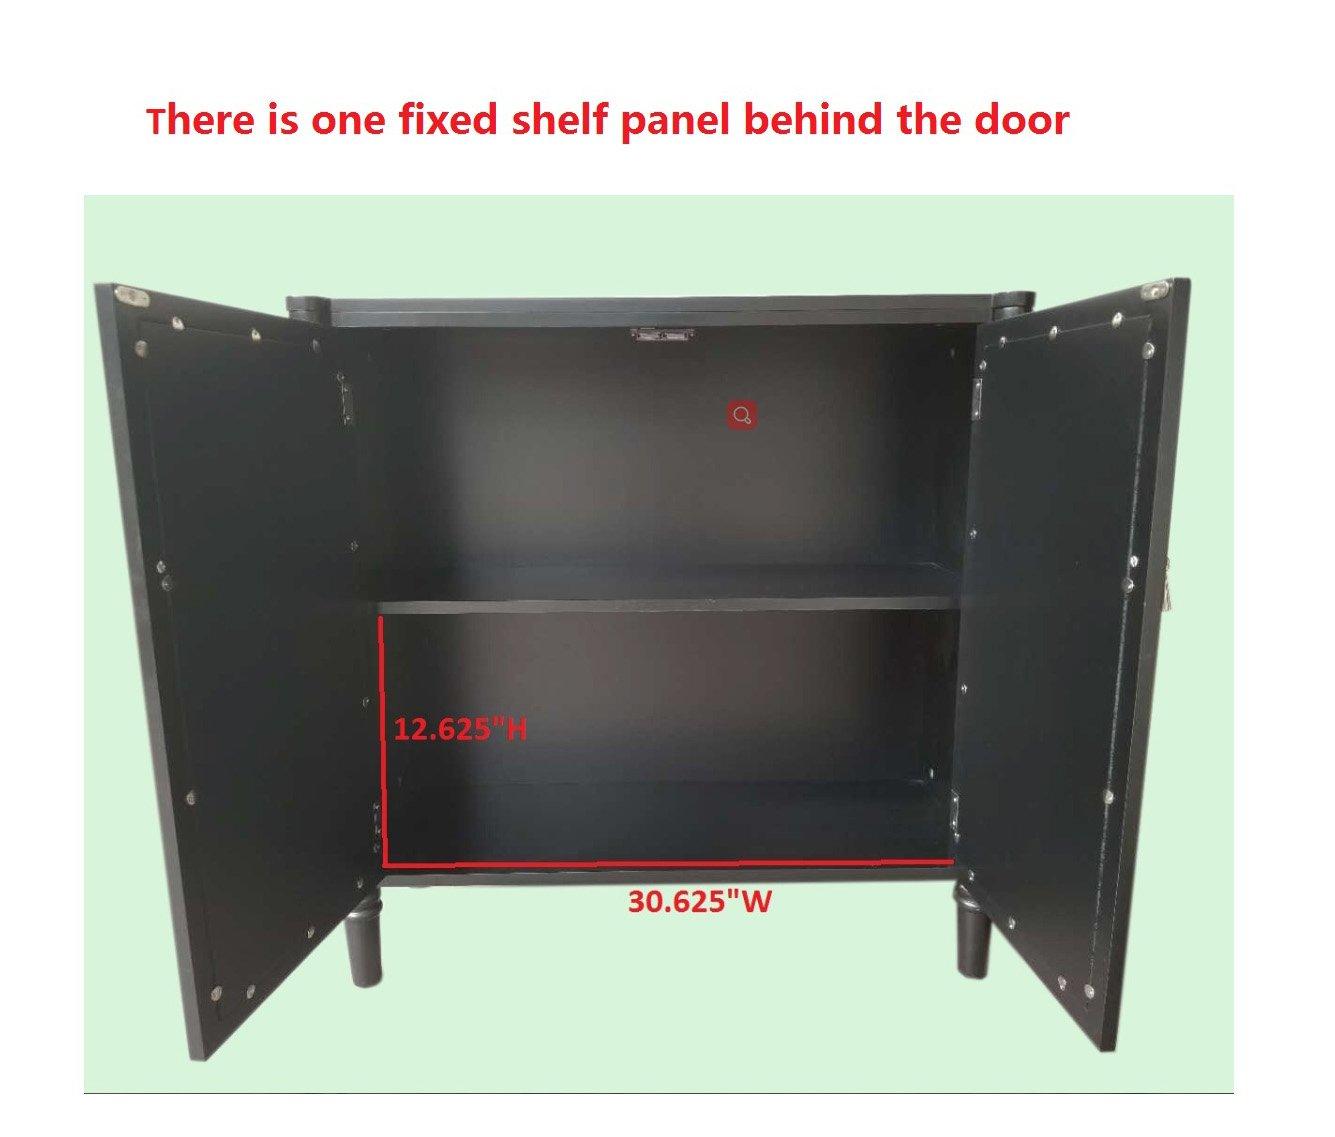 Kings Brand Furniture 2 Door Entryway Console Table Accent Cabinet, Black by Kings Brand Furniture (Image #3)